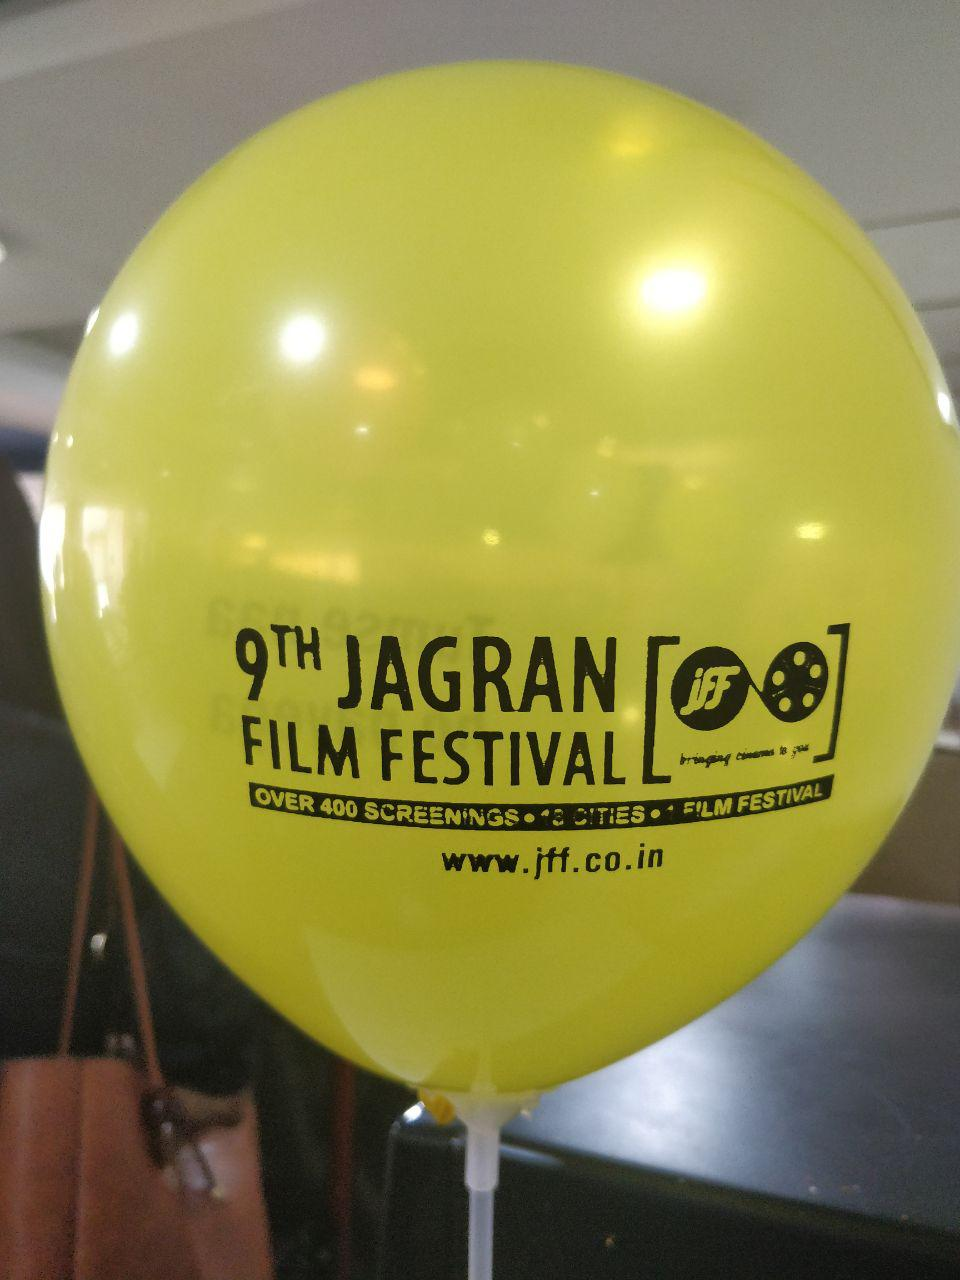 9th jagran film festival